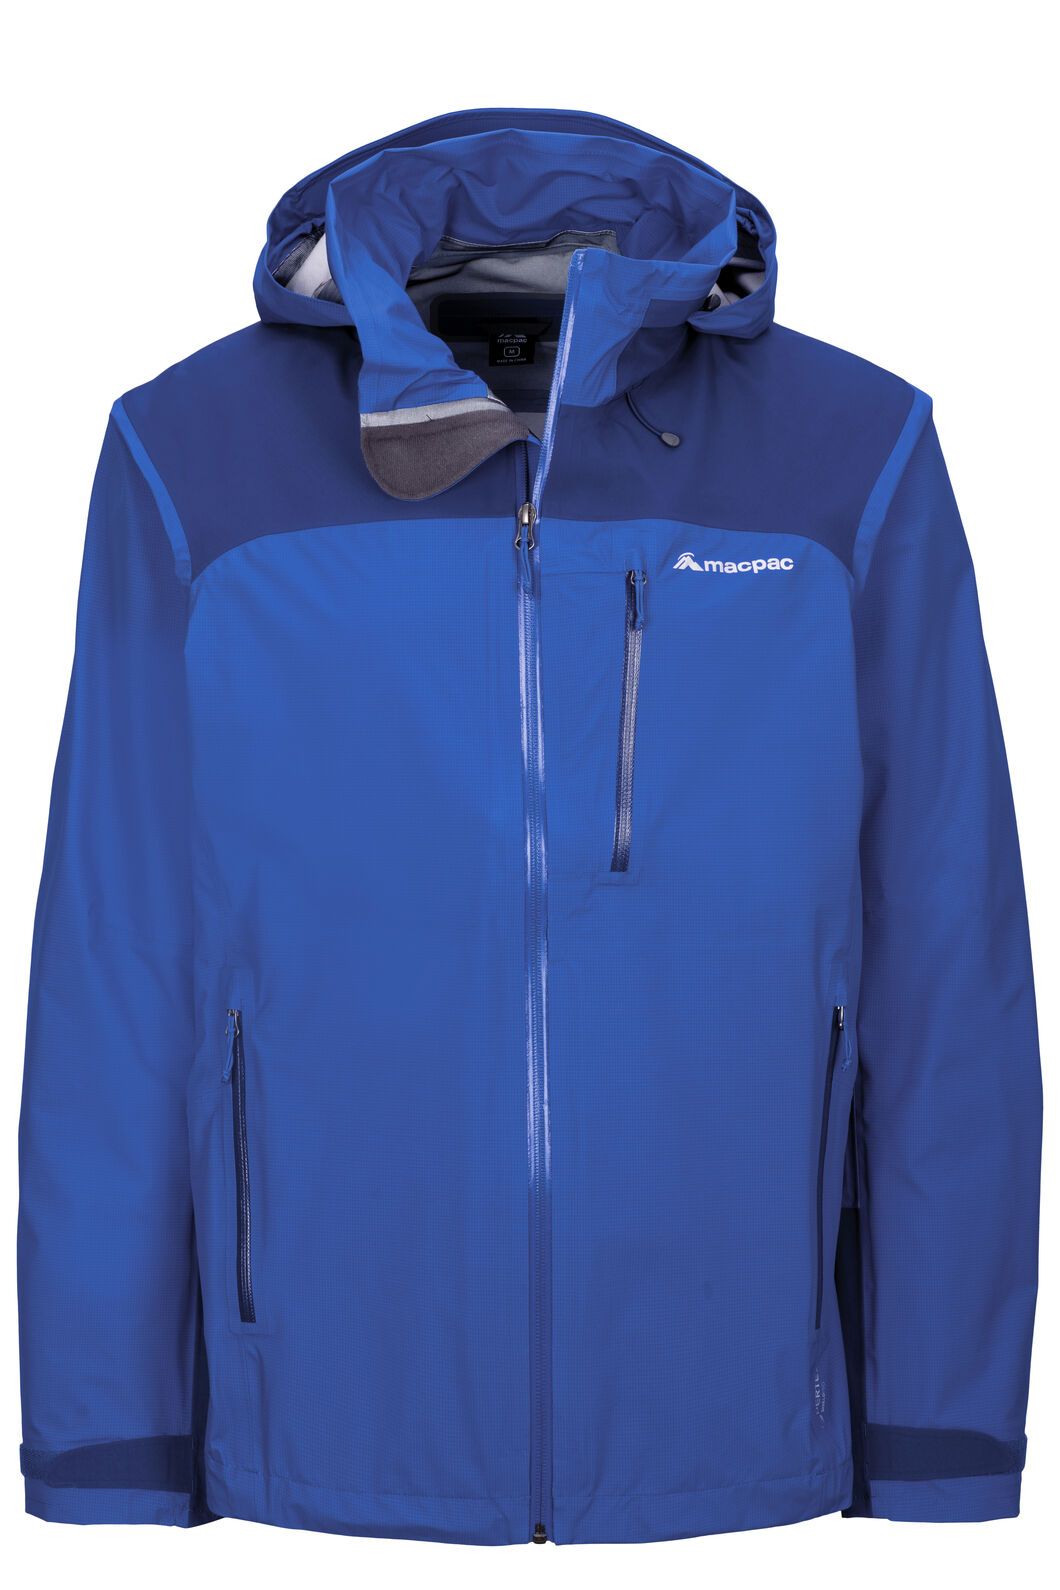 Macpac Men's Traverse Pertex® Rain Jacket, Surf The Web, hi-res